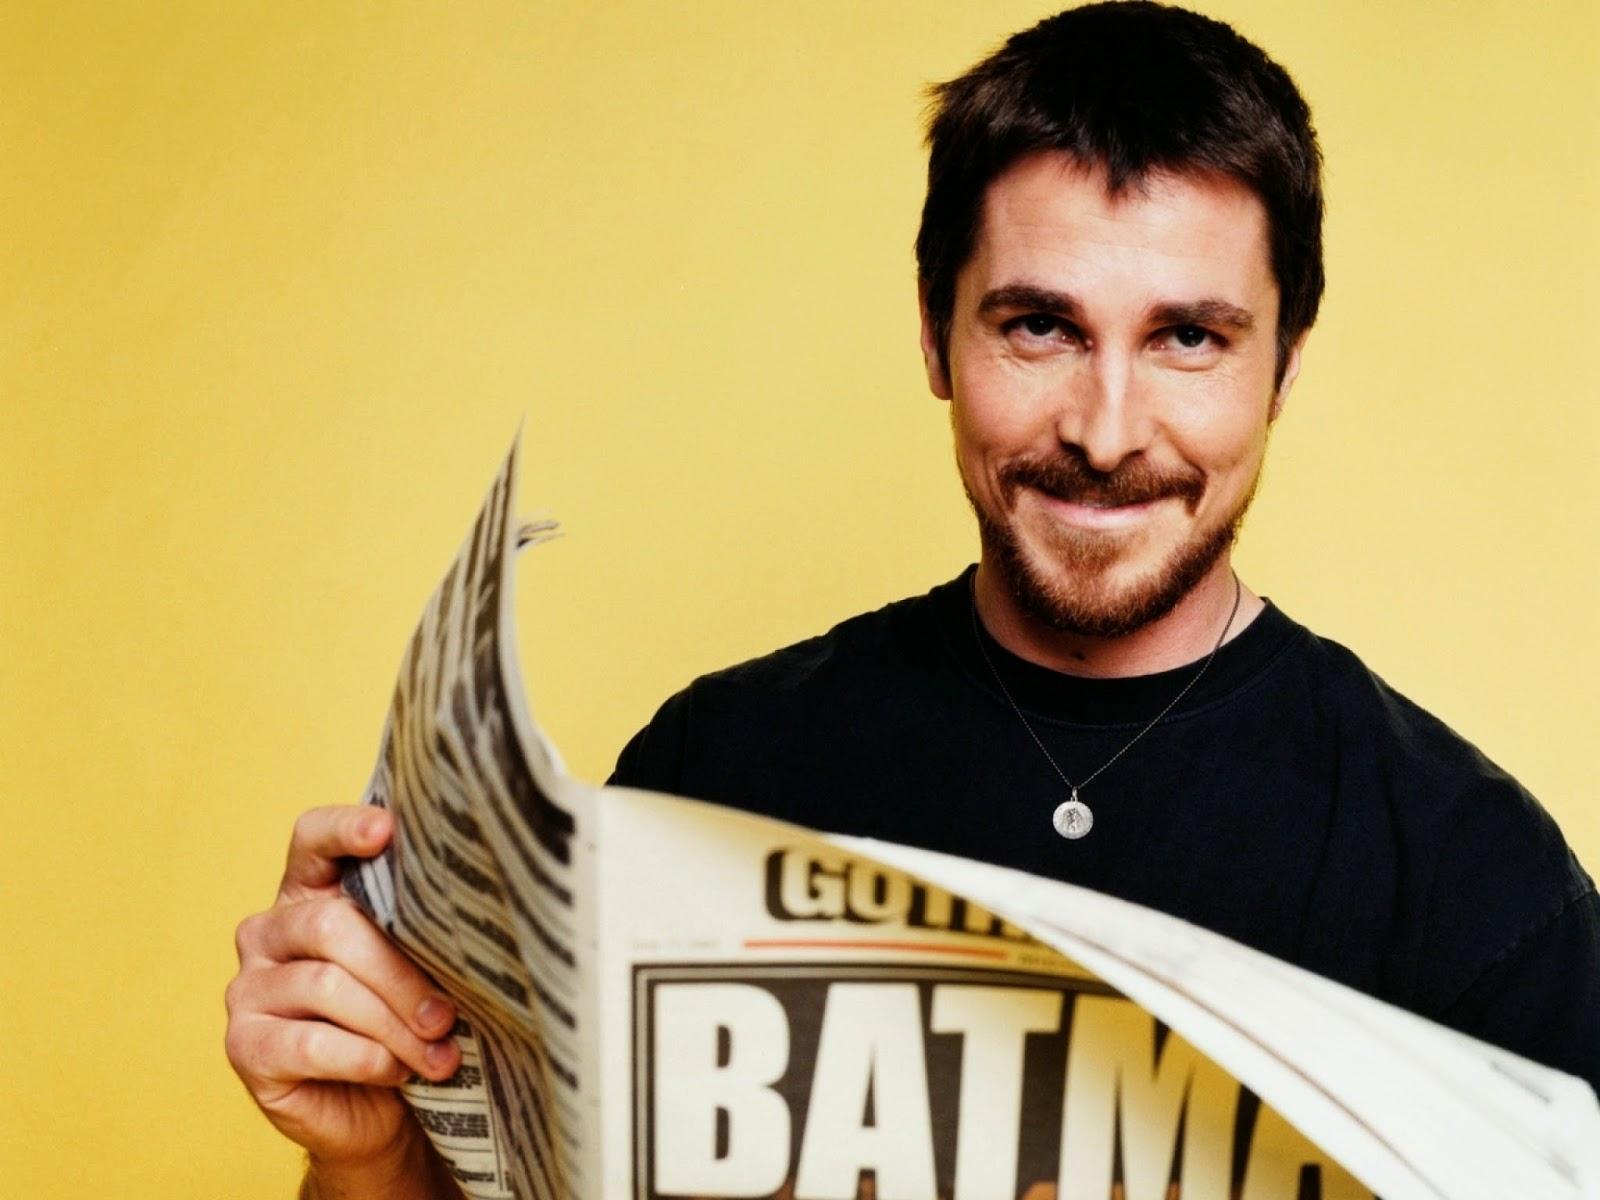 Christian Bale: Christian Bale HD Wallpapers